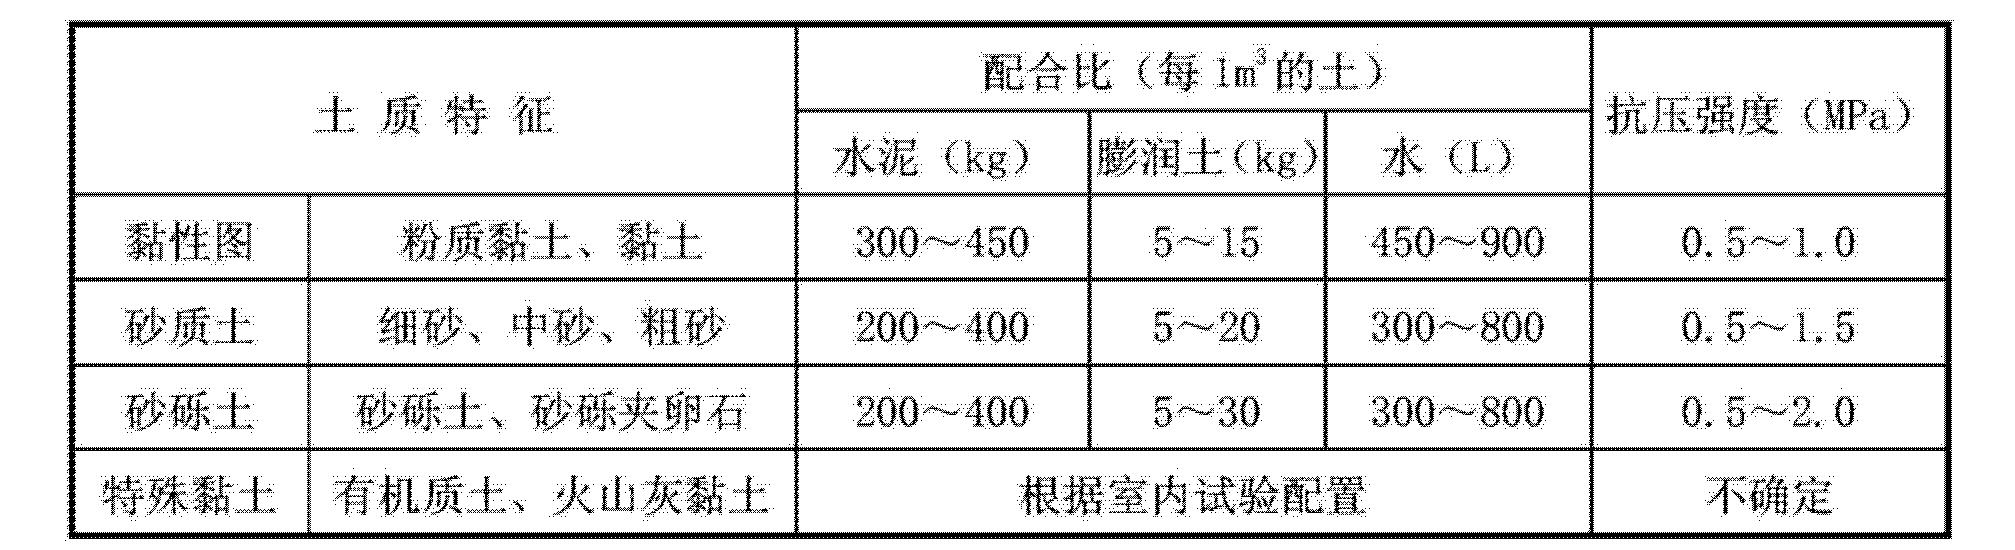 Figure CN203475440UD00062